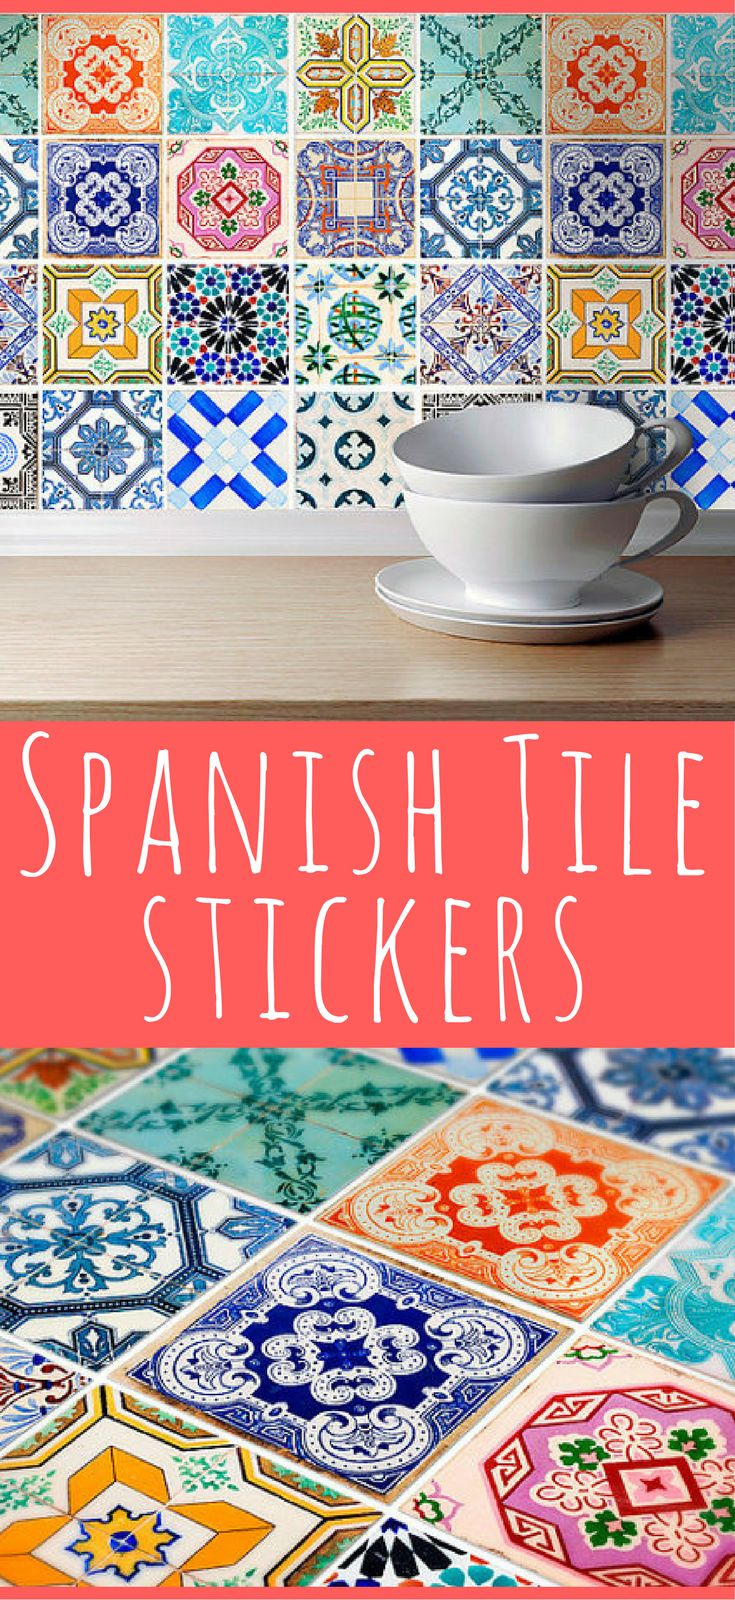 best 25 spanish tile kitchen ideas on pinterest moroccan tile traditional spanish tiles stickers tiles decals tiles for kitchen backsplash or bathroom bathroom